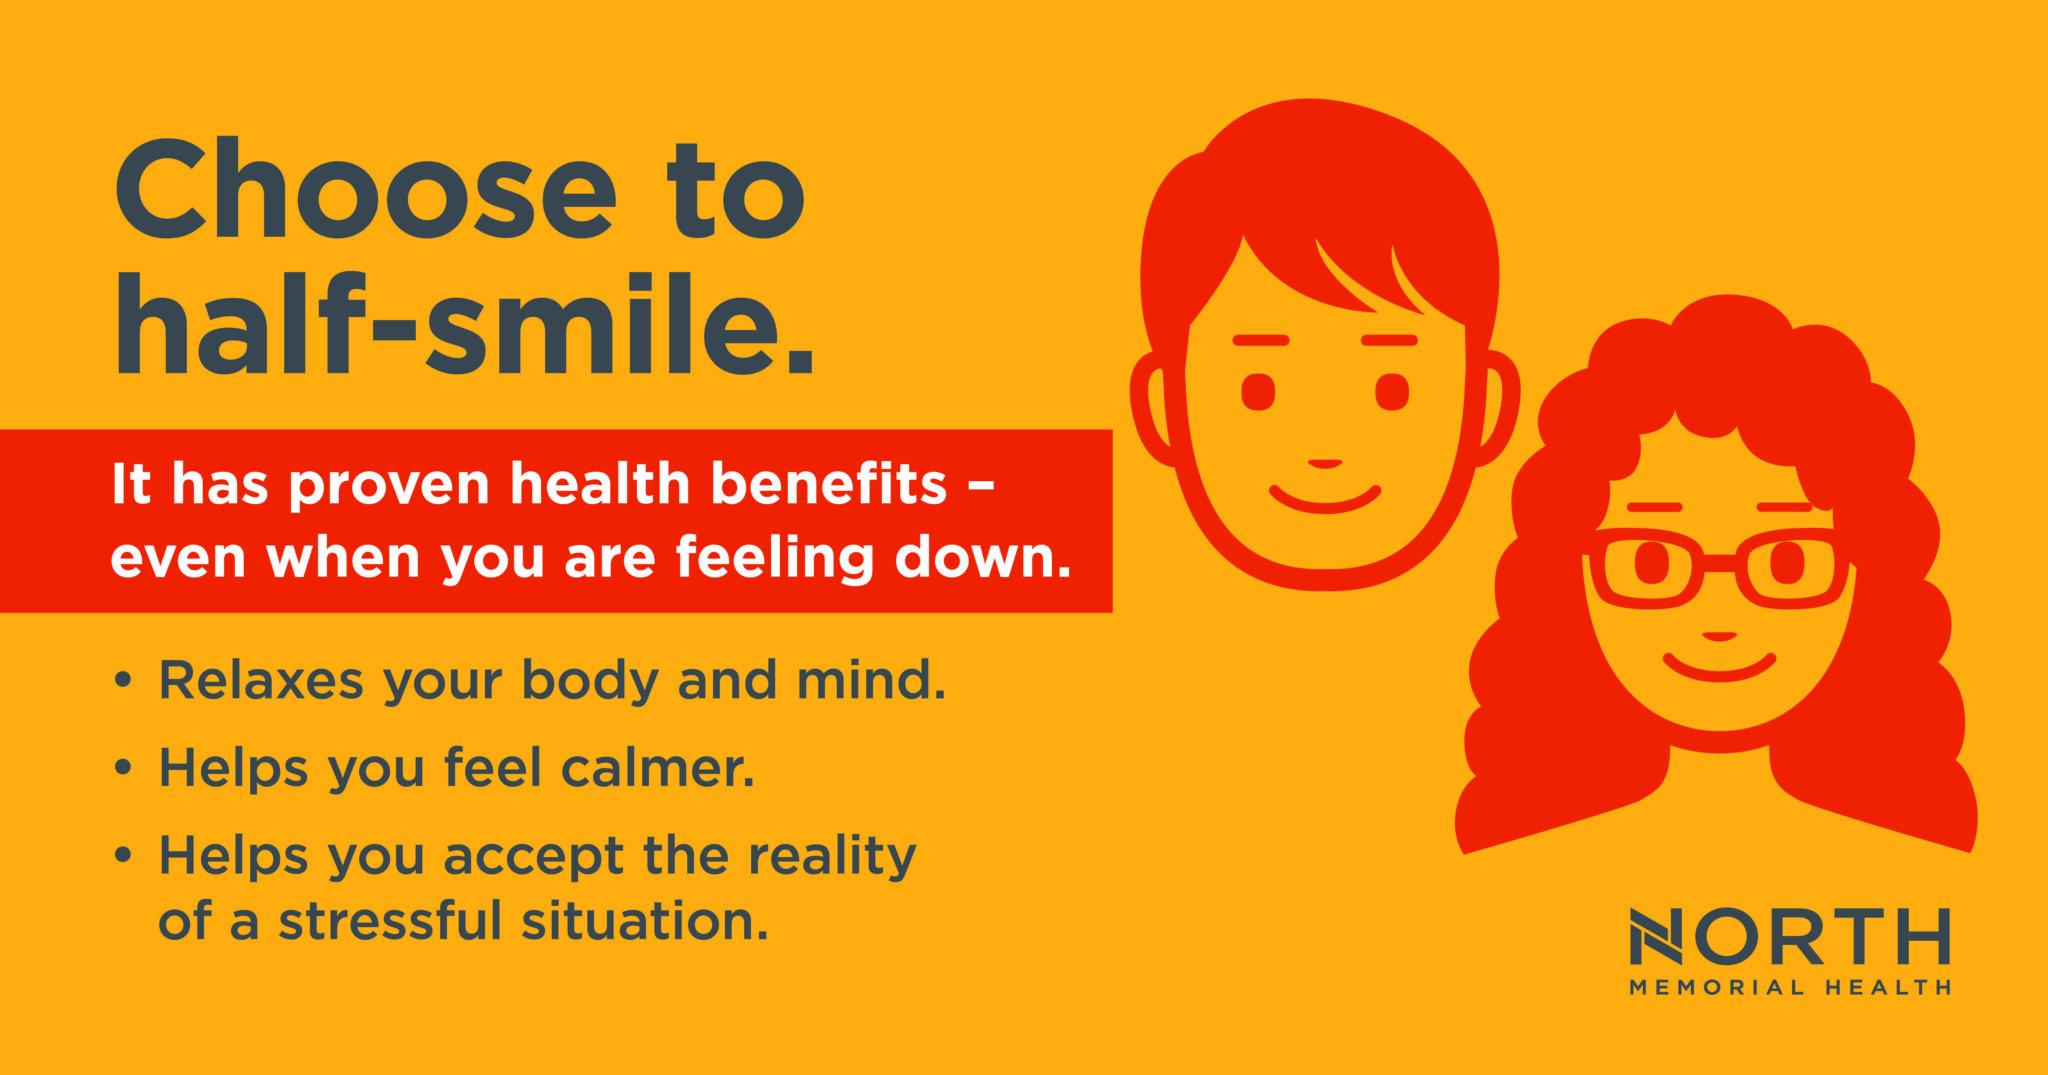 half smile benefits to reduce emotional distress